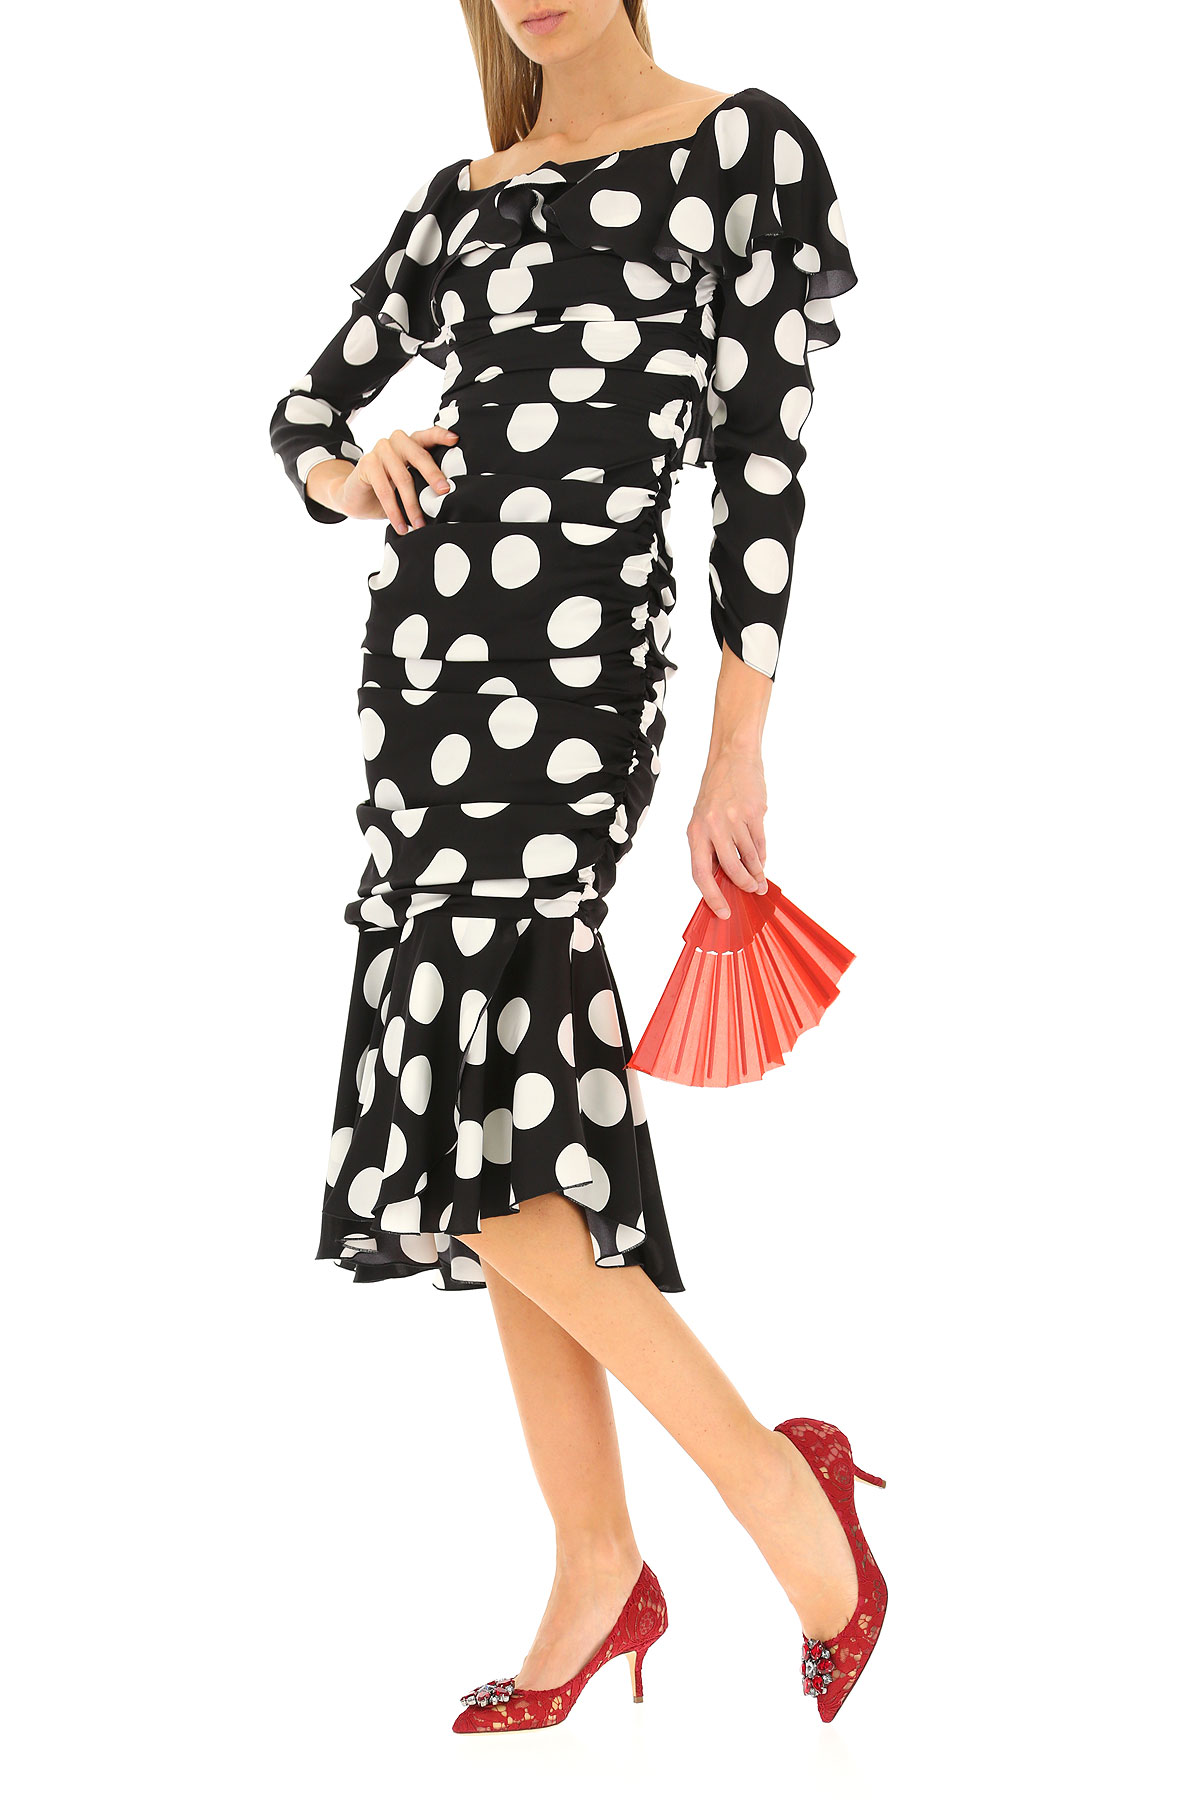 Para Primavera verano amp; Ropa Mujer Blanco Gabbana Negro Dolce 2019 tXwaq